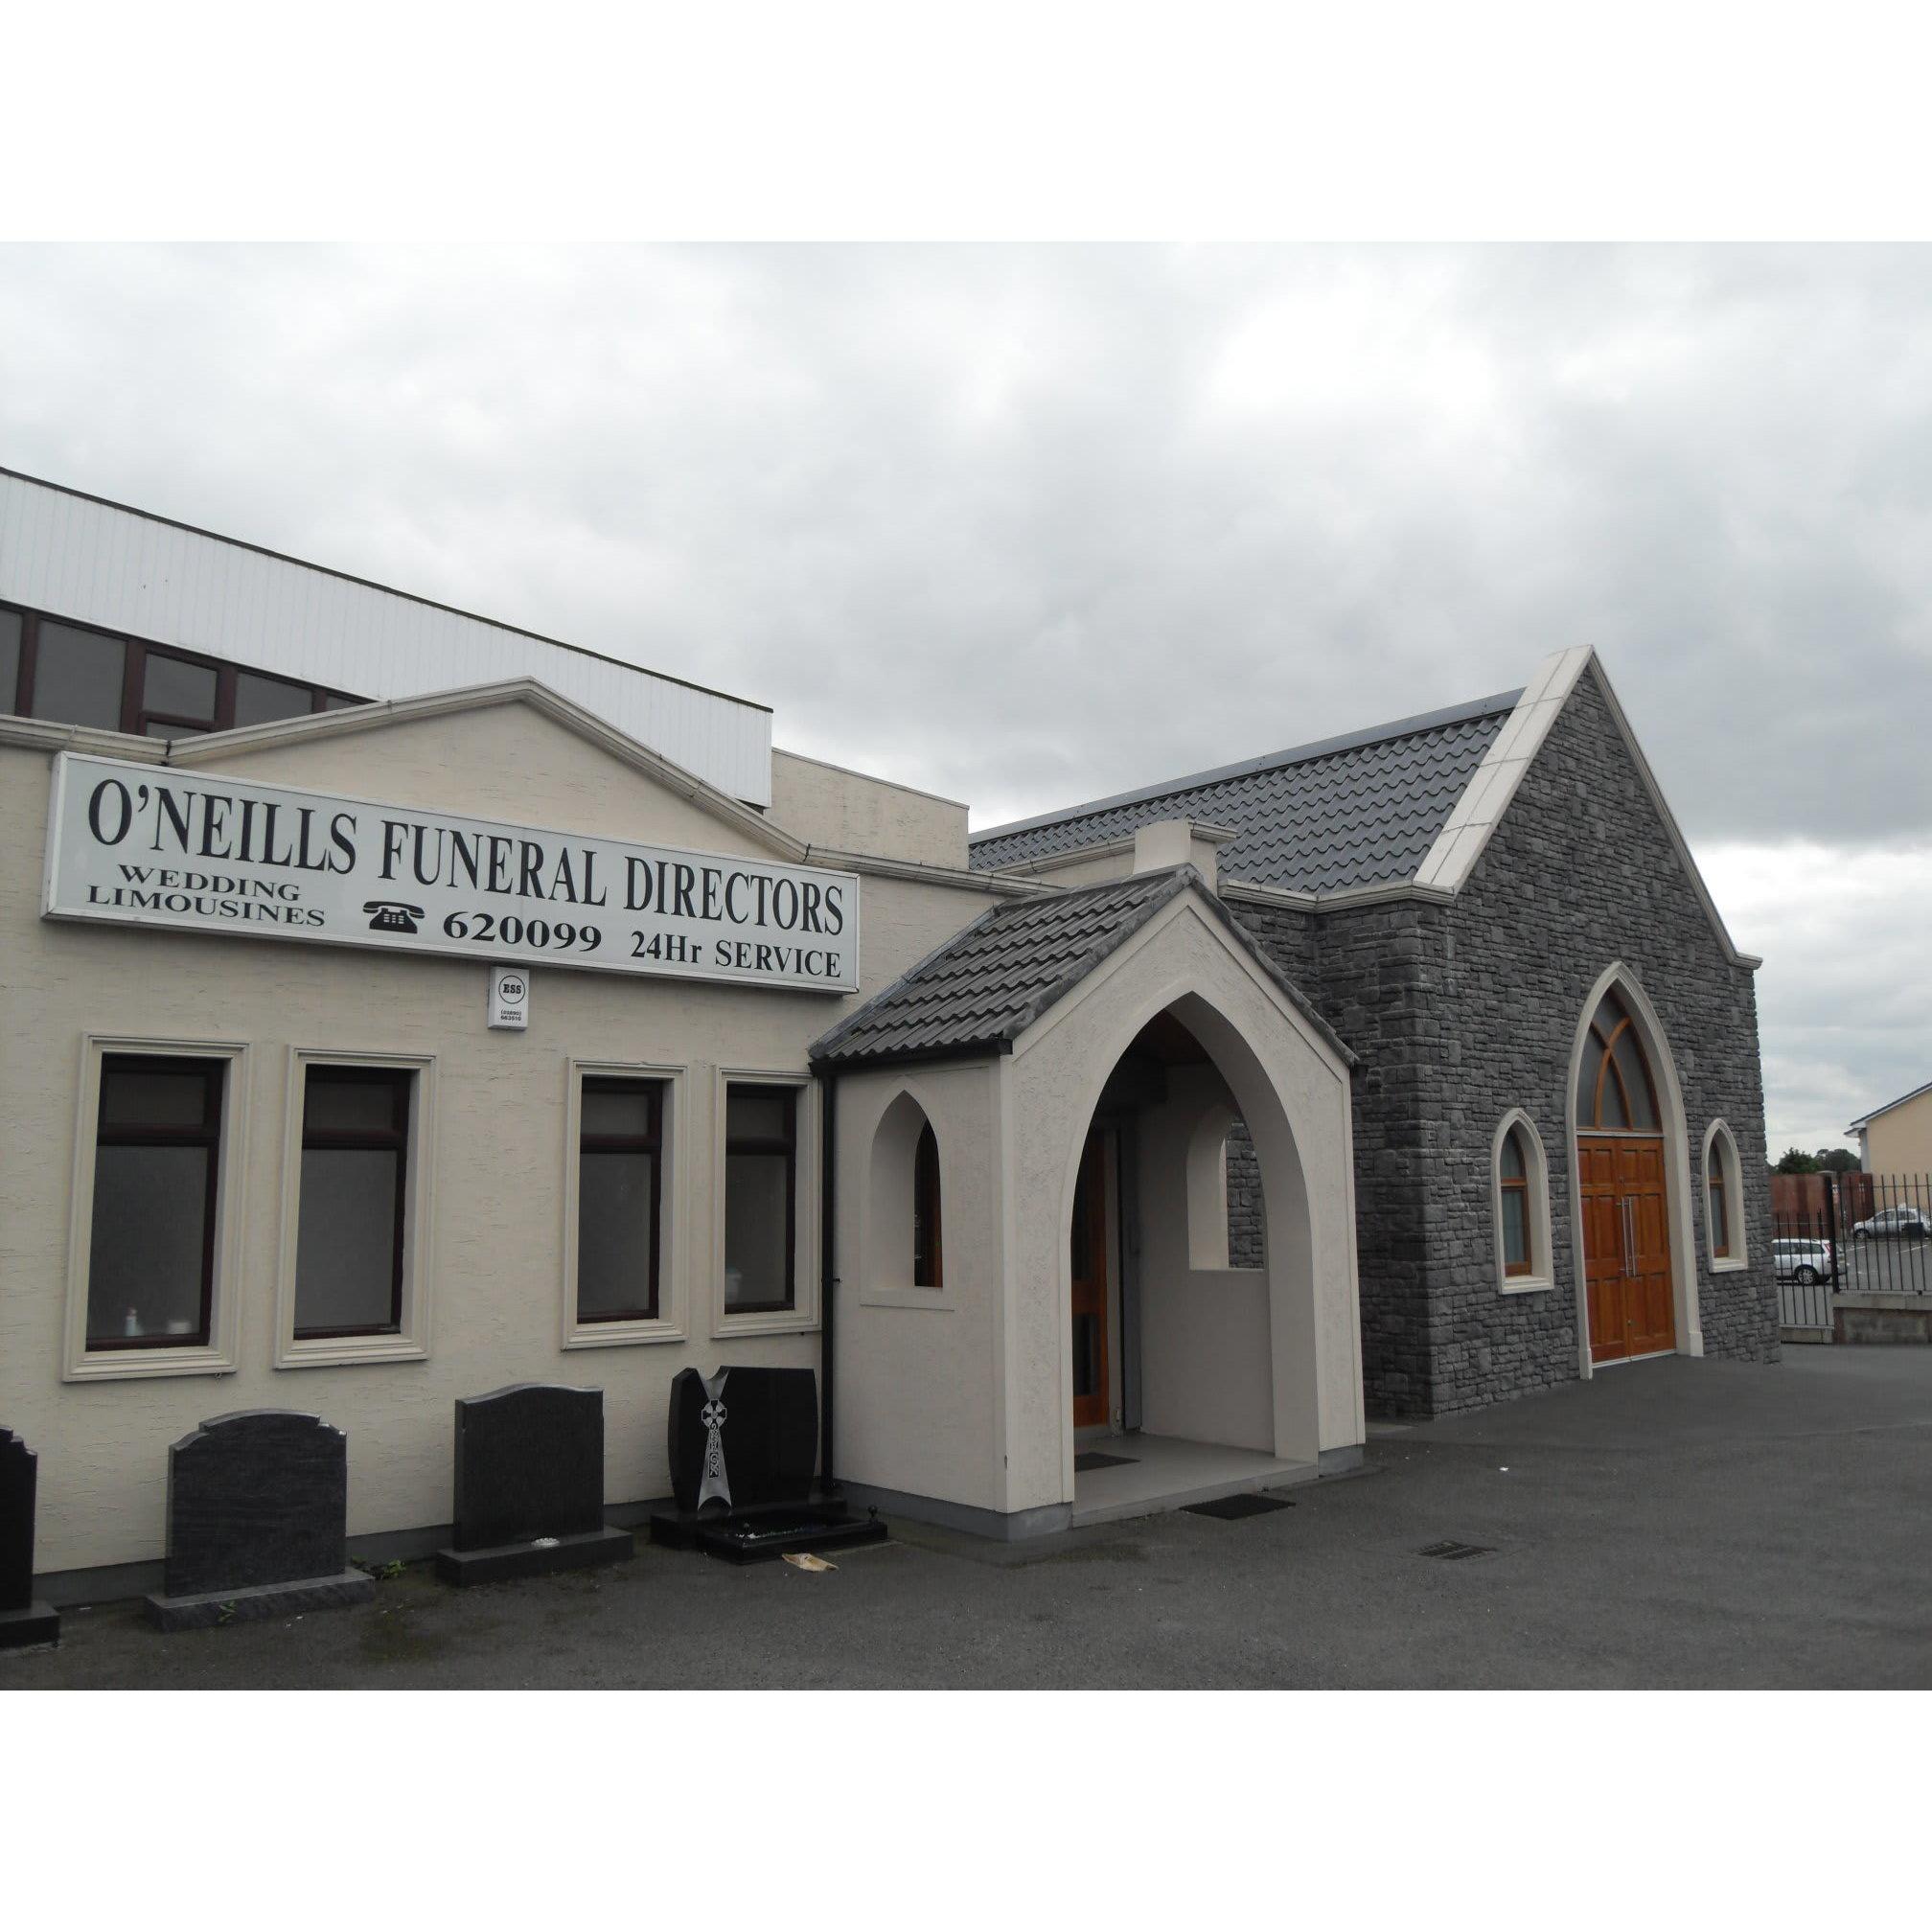 O'Neills Funeral Directors